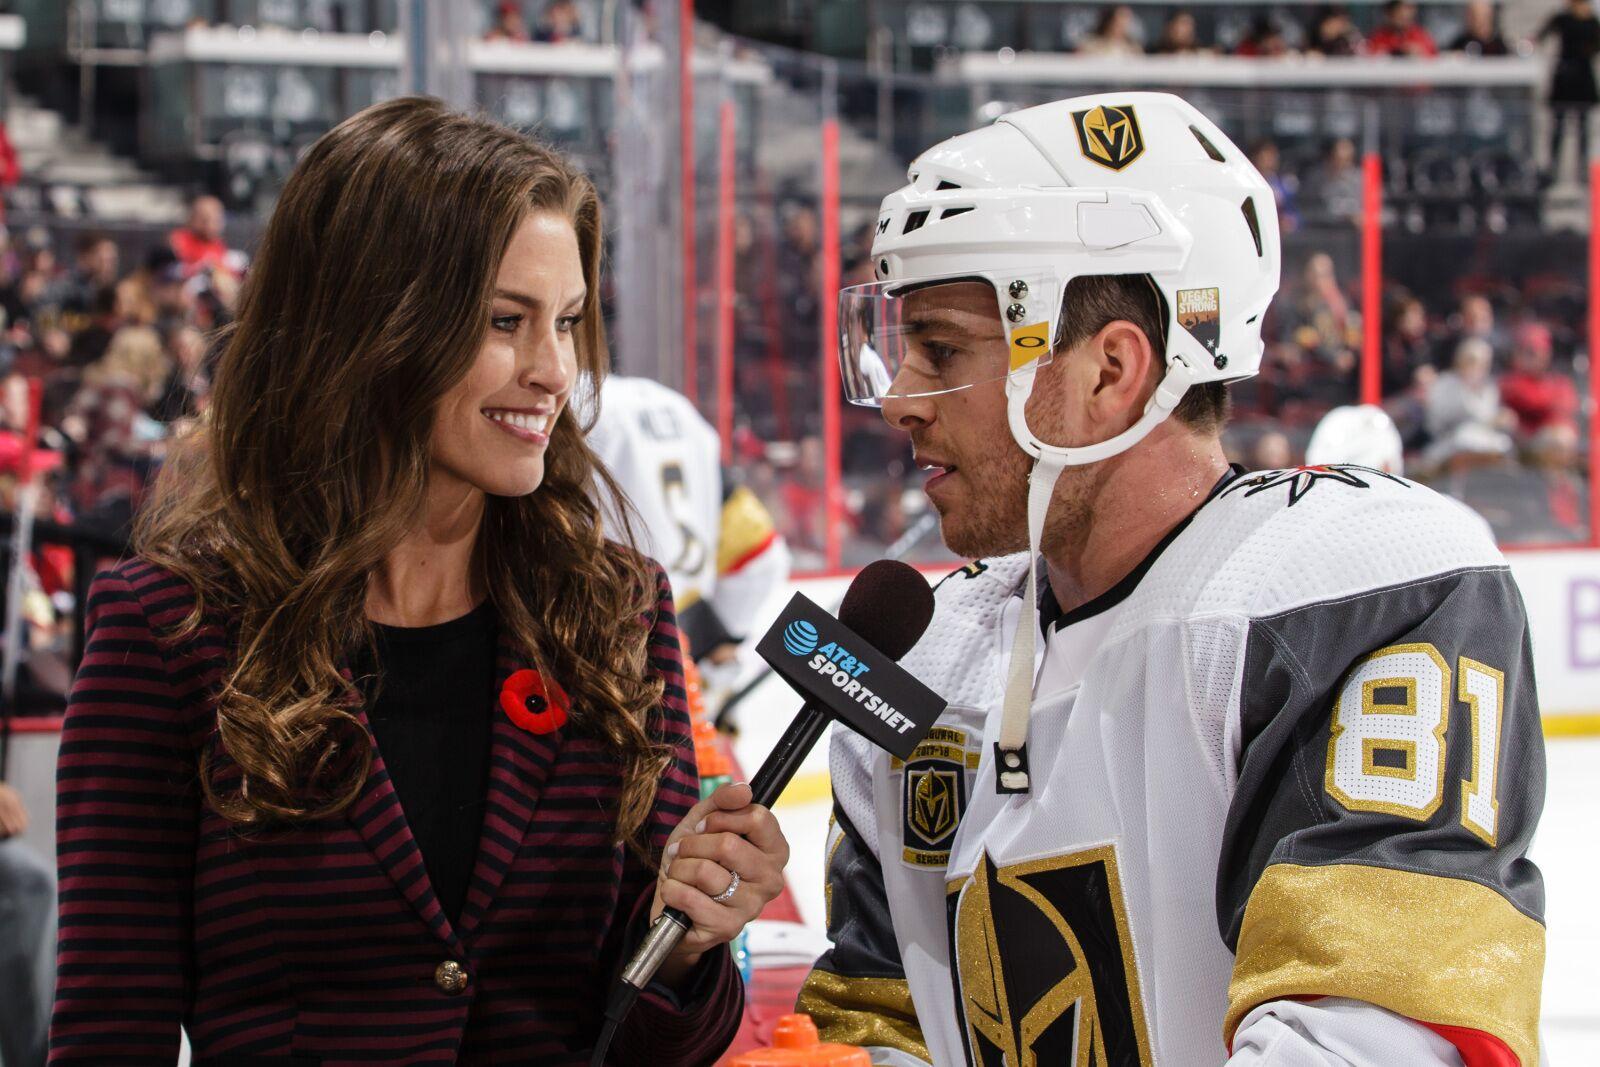 Anaheim Ducks Hire Alyson Lozoff as Rinkside Reporter